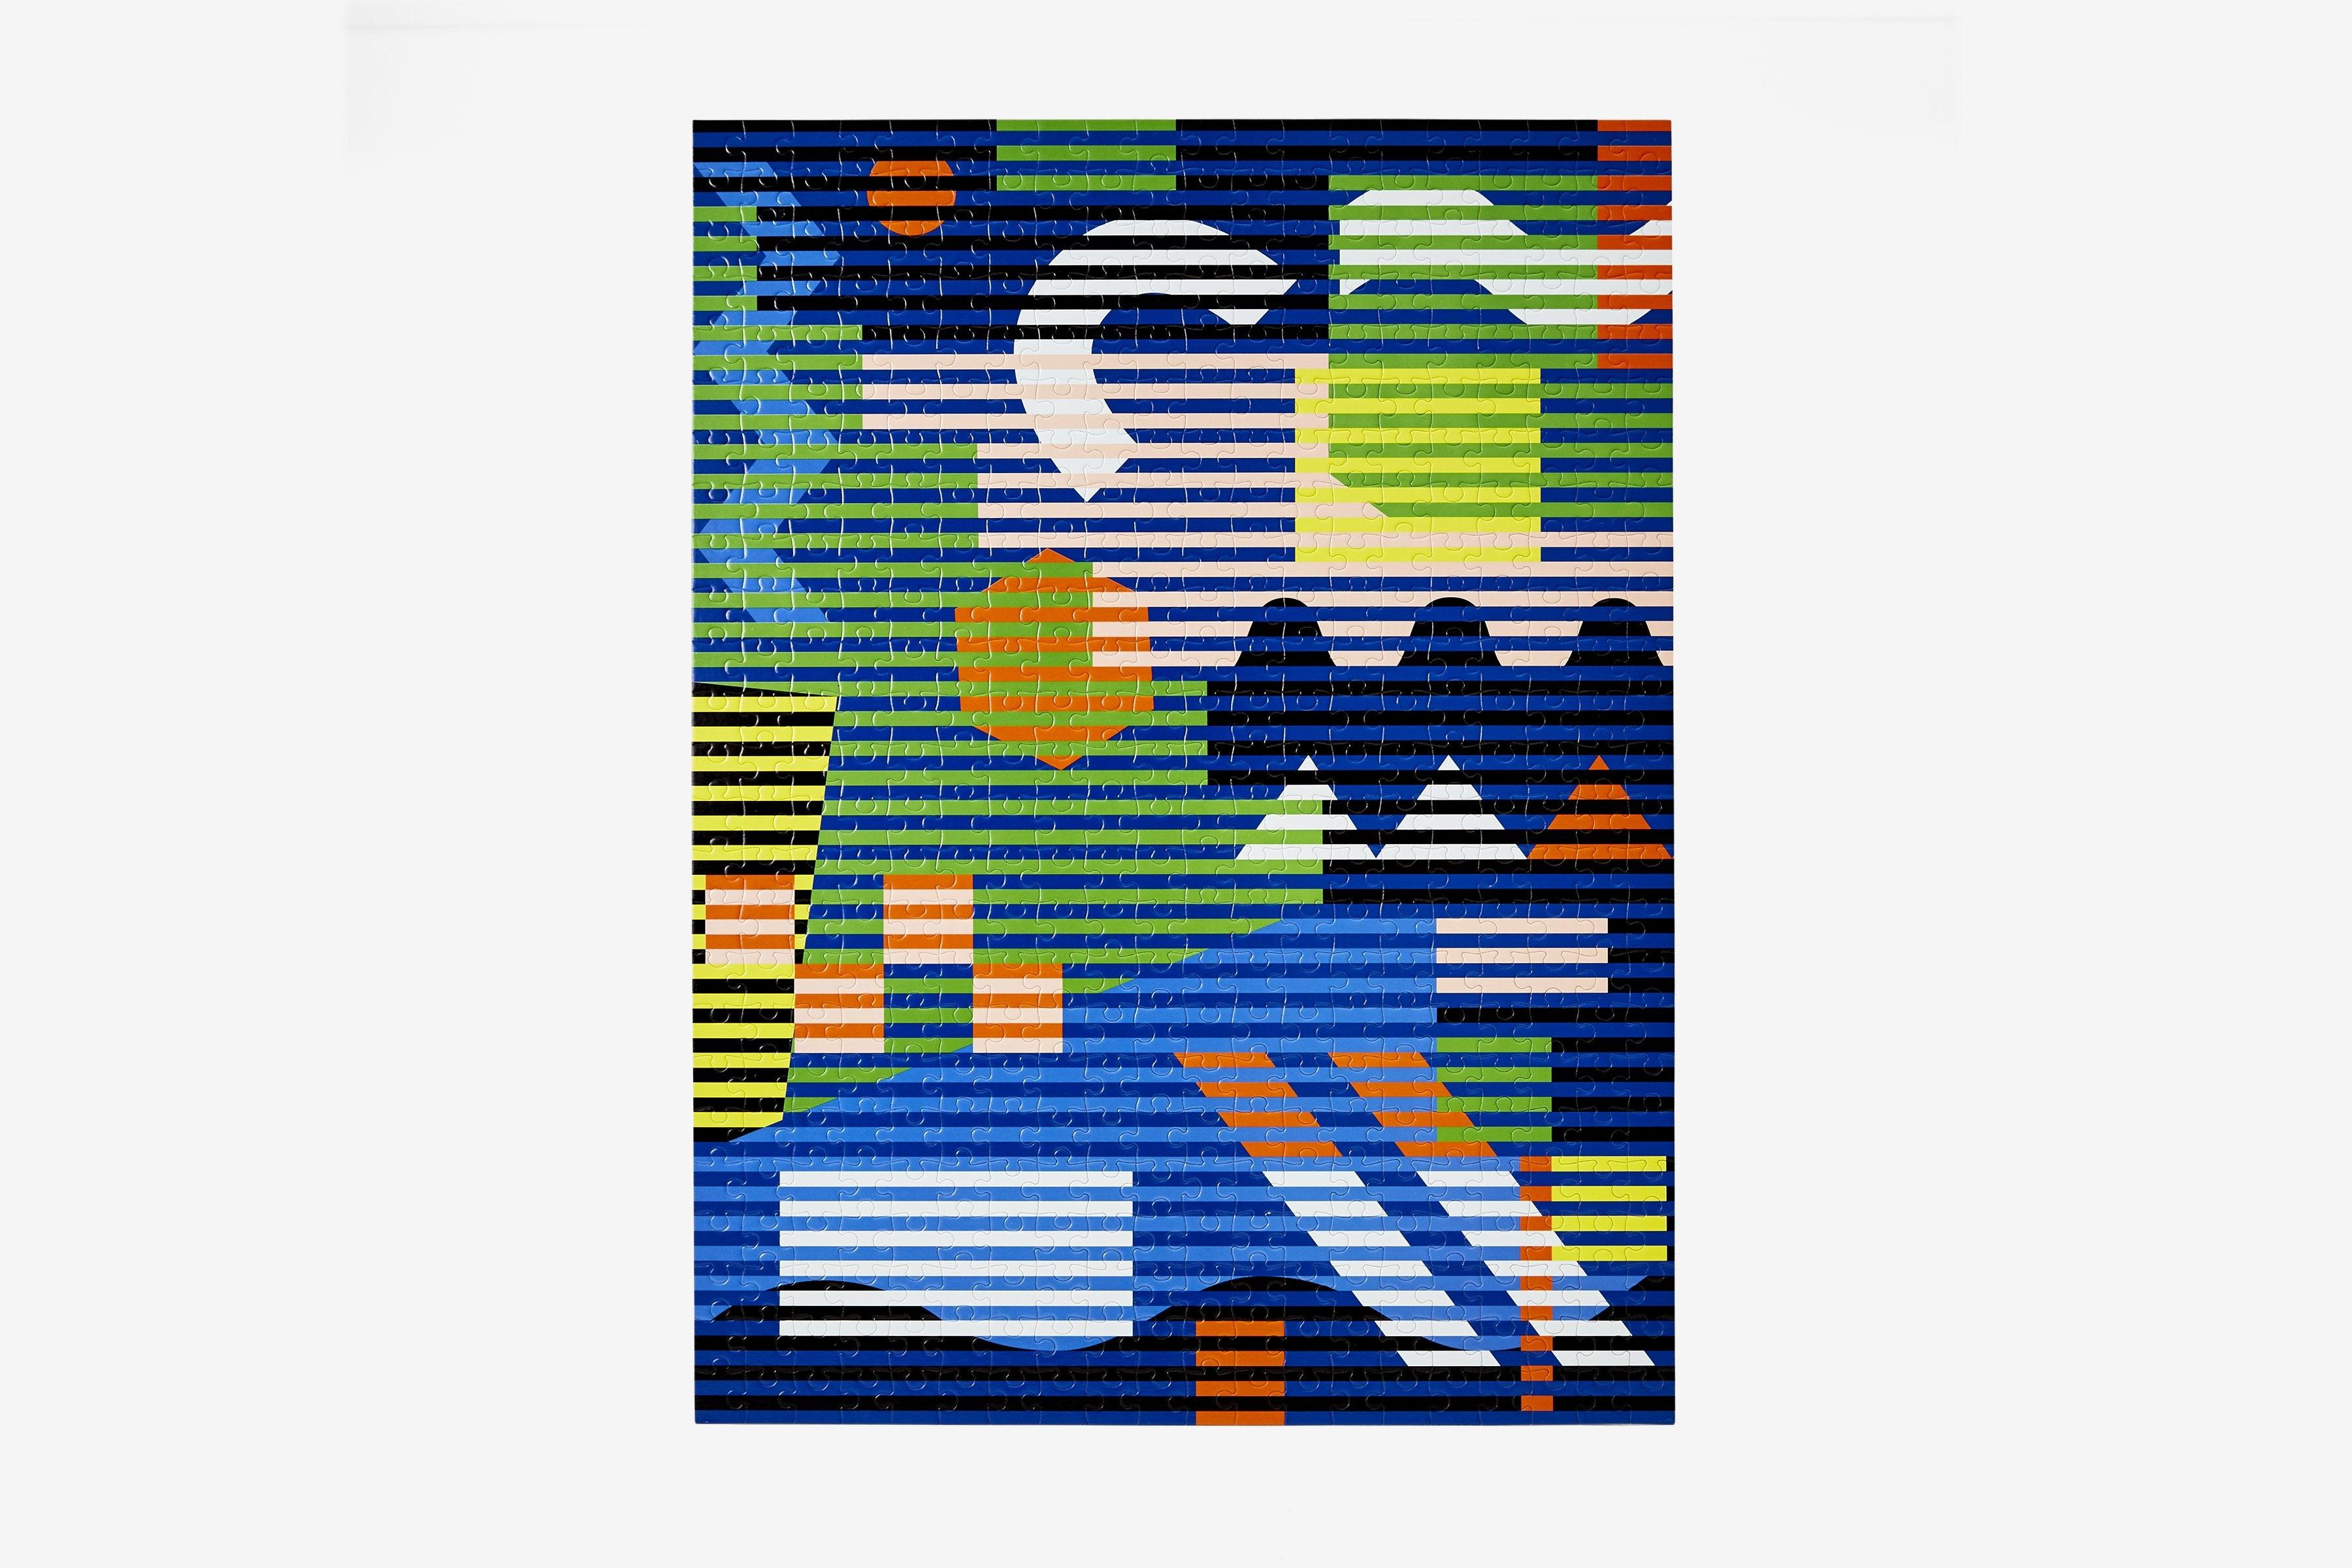 PatternPuzzle-Lenticular-Silo-01-DDPP_d22ad82a-875c-4992-b610-a11d412401c9_3600x@2x